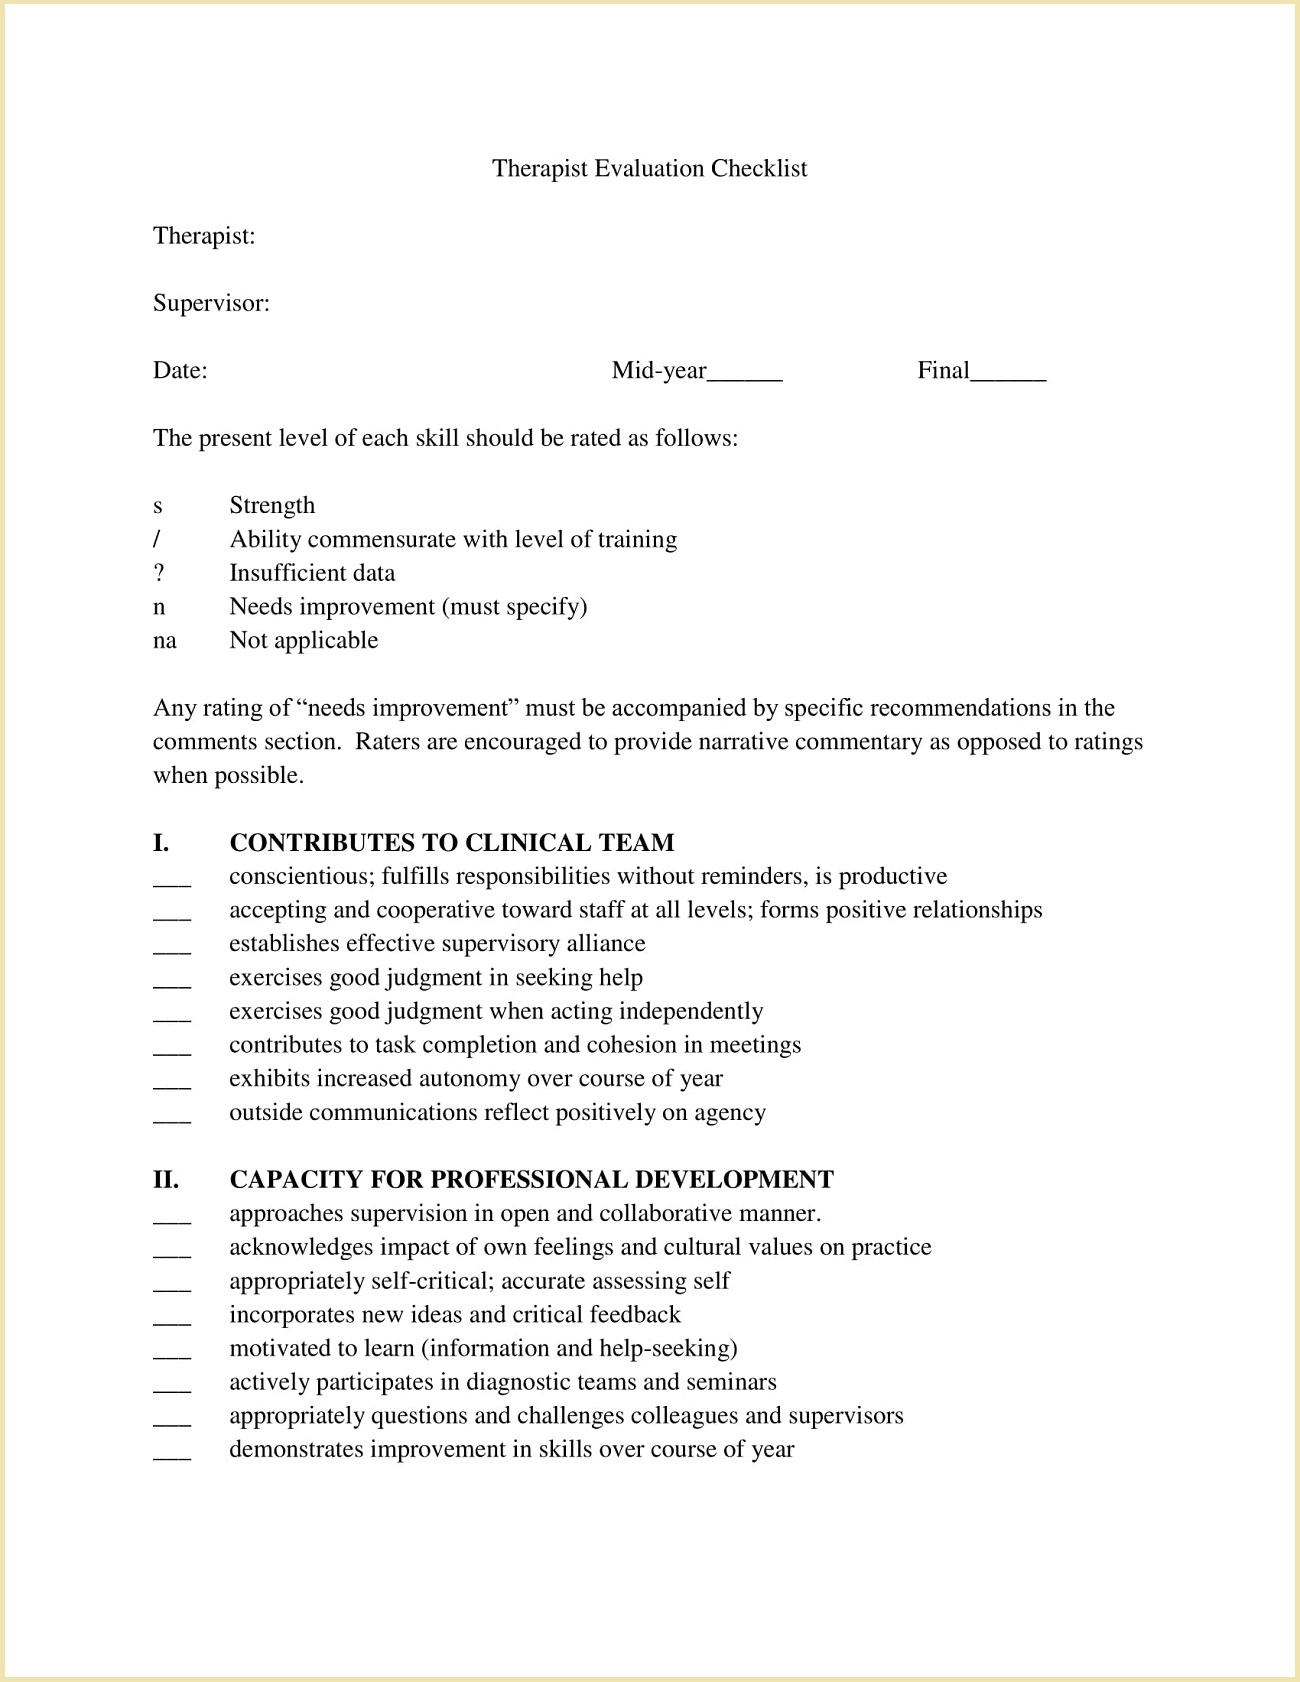 Therapist Evaluation Checklist Form Template PDF